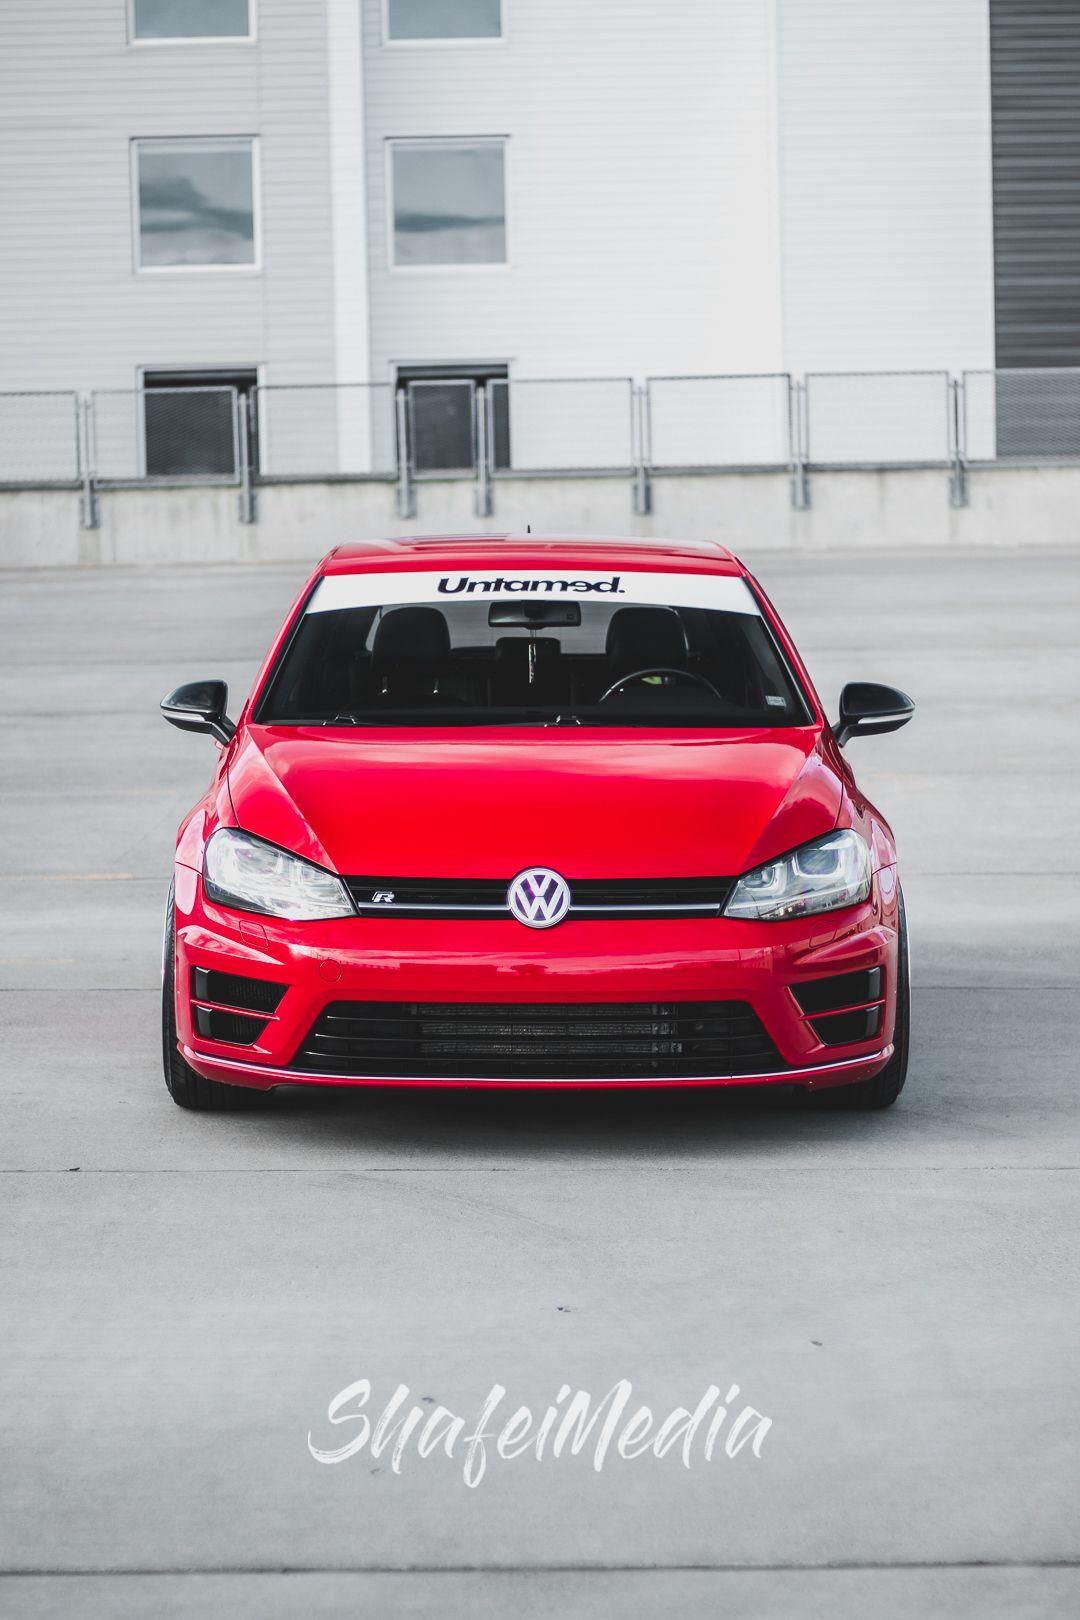 Vw Golf Type R Vw Golf Vw Volkswagen Supercars Concept